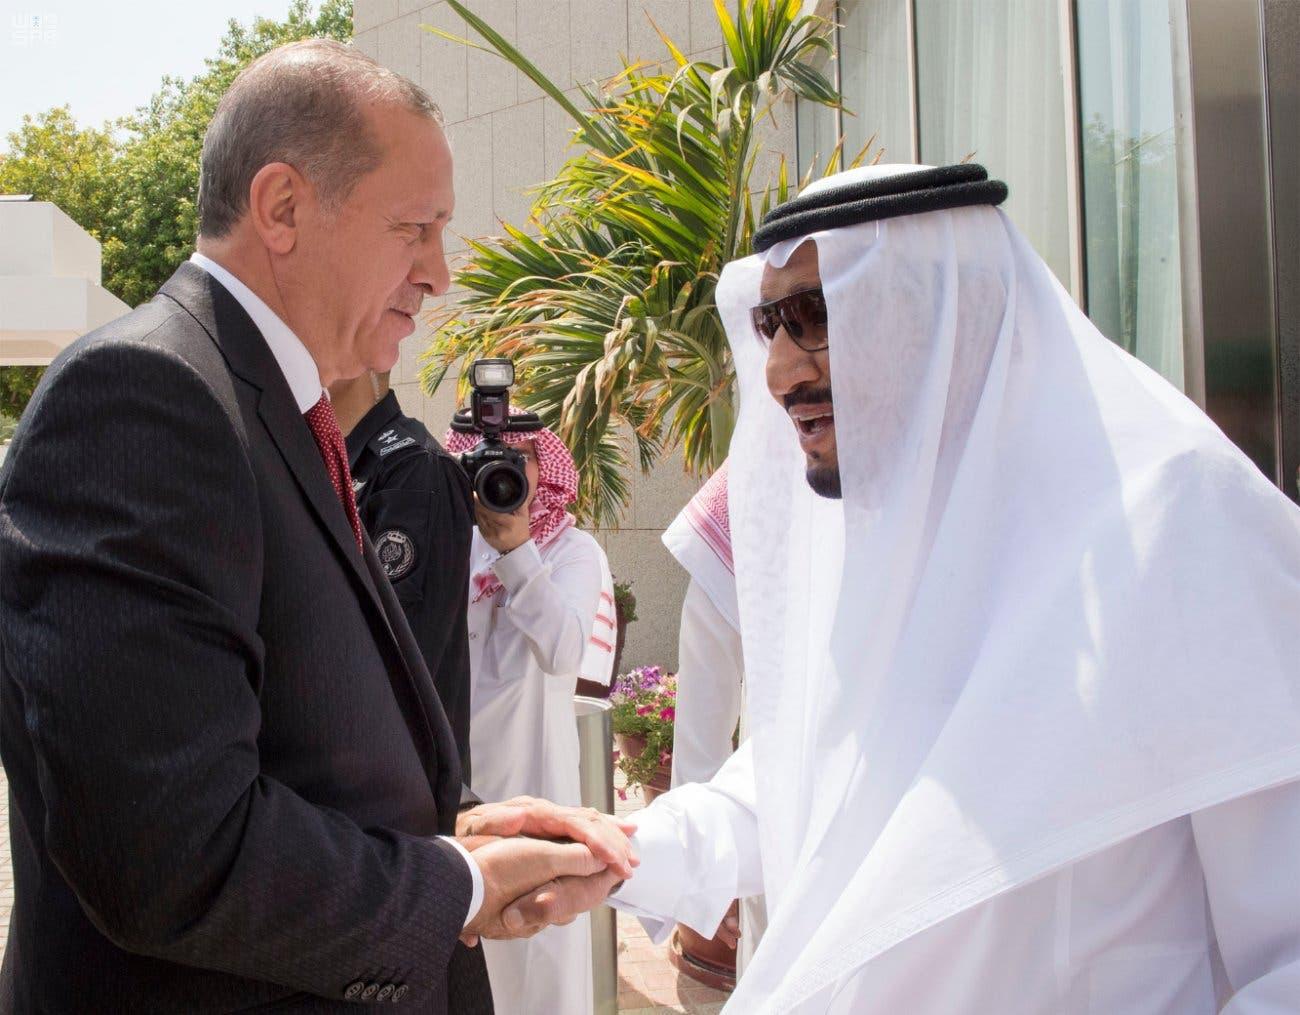 Erdogan meets with Saudi King Salman as part of Qatar crisis mediation